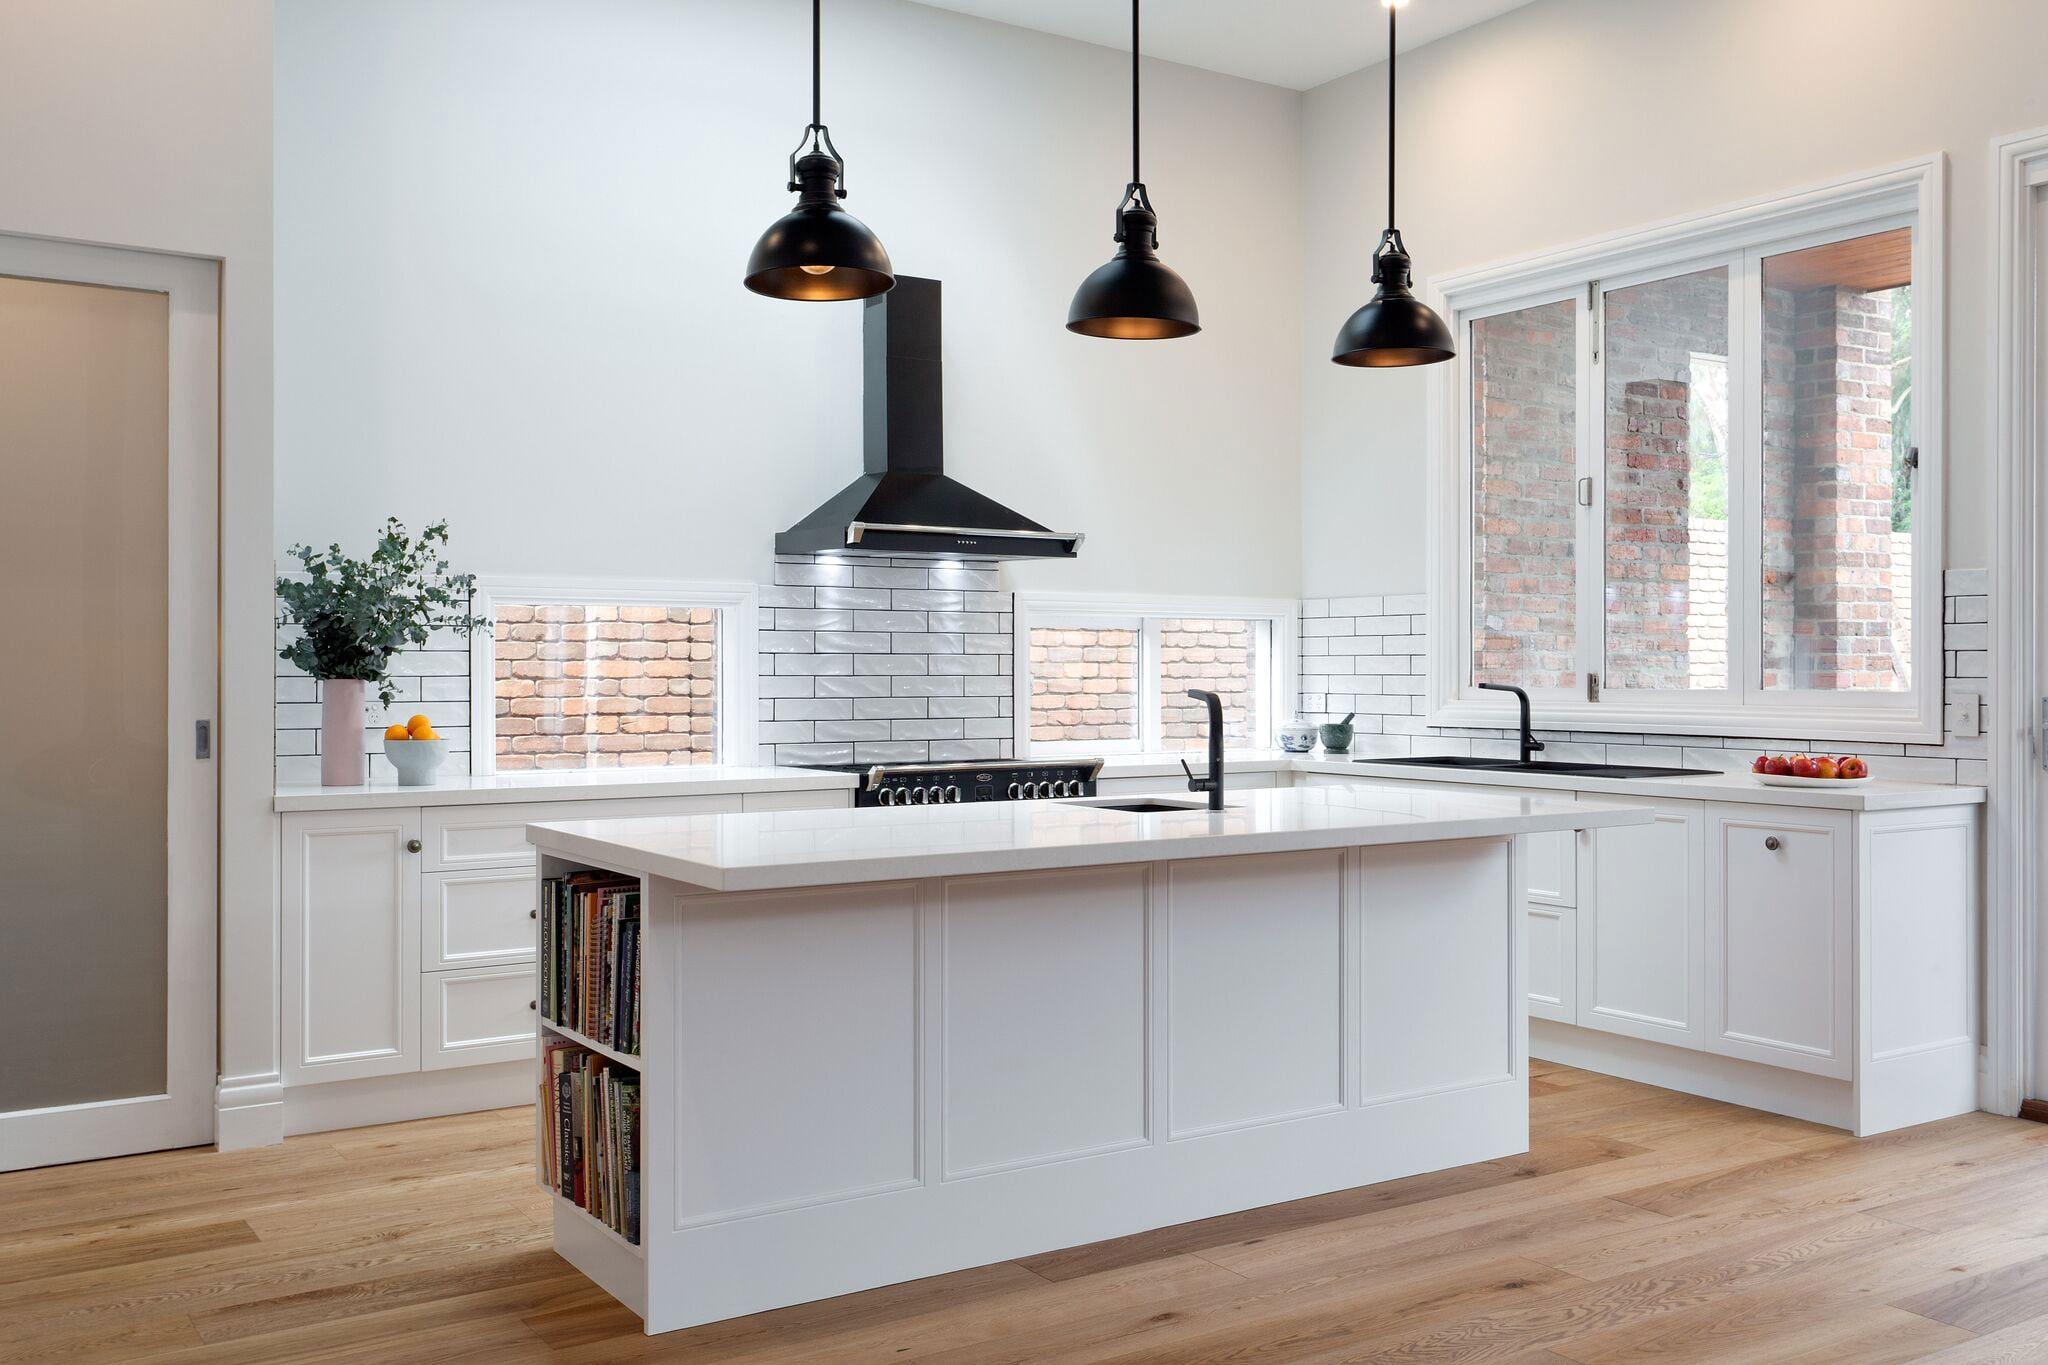 Direct Kitchens - Kitchen Renovations & Designs - 1 Power ...